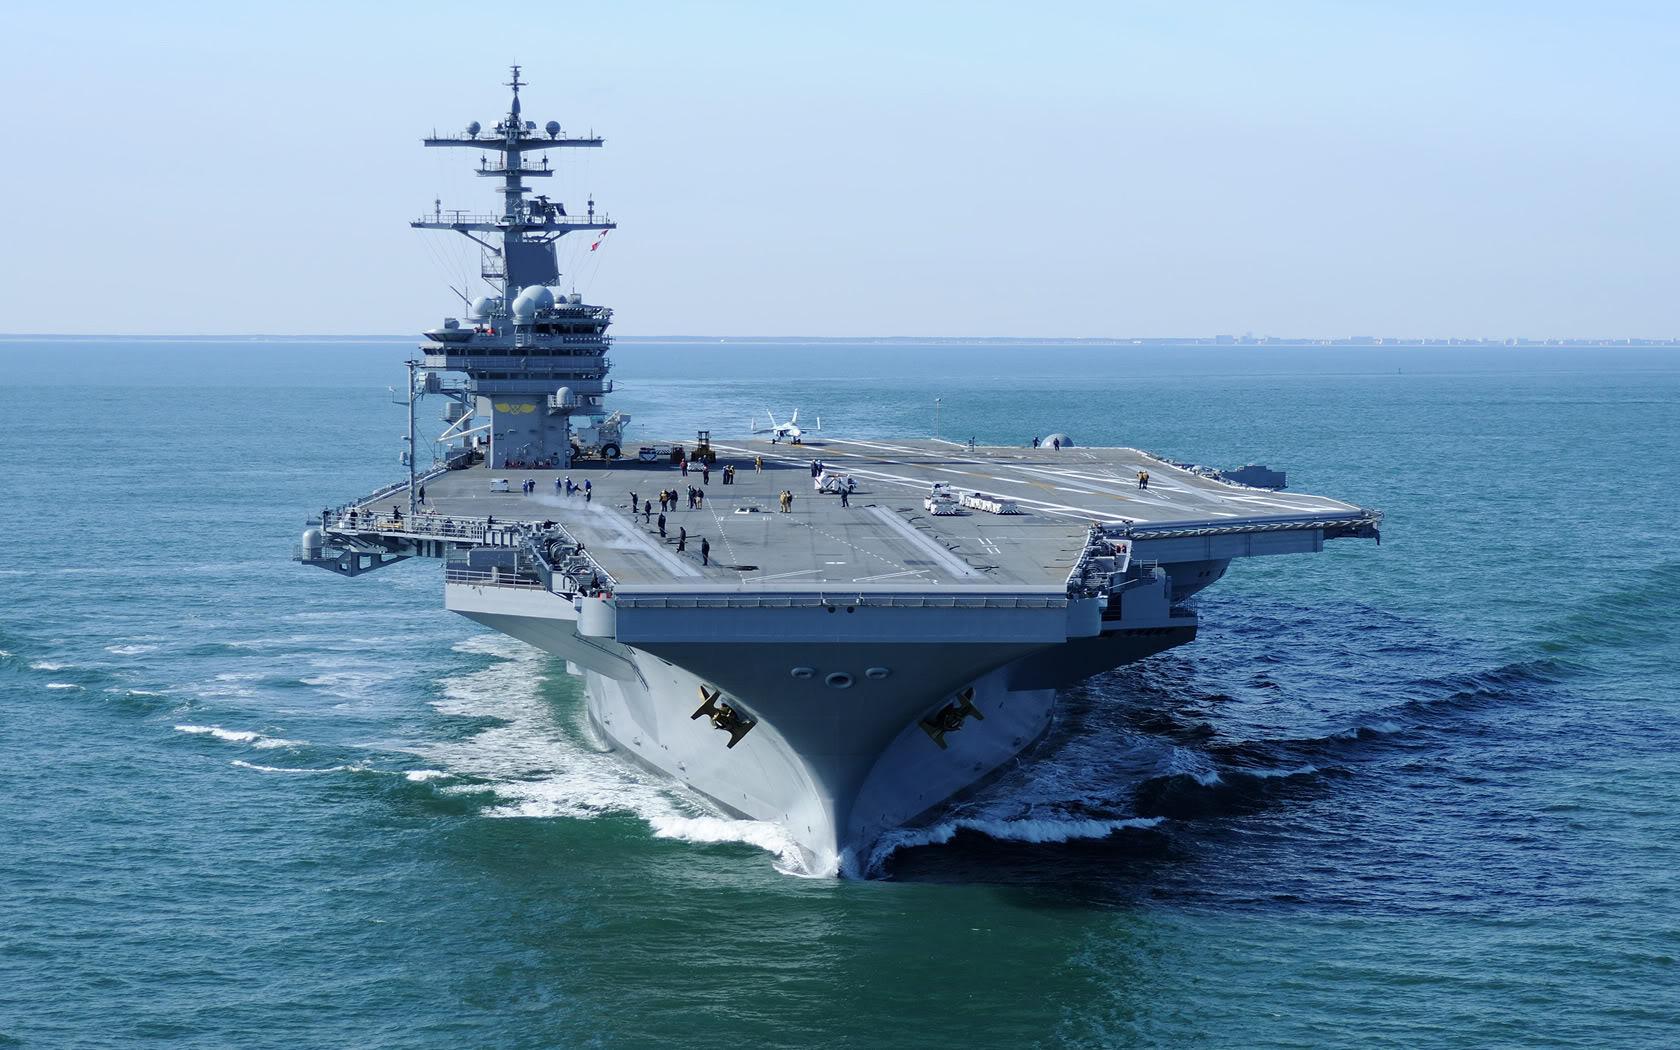 USS George H.W. Bush (CVN-77) wallpapers HD quality